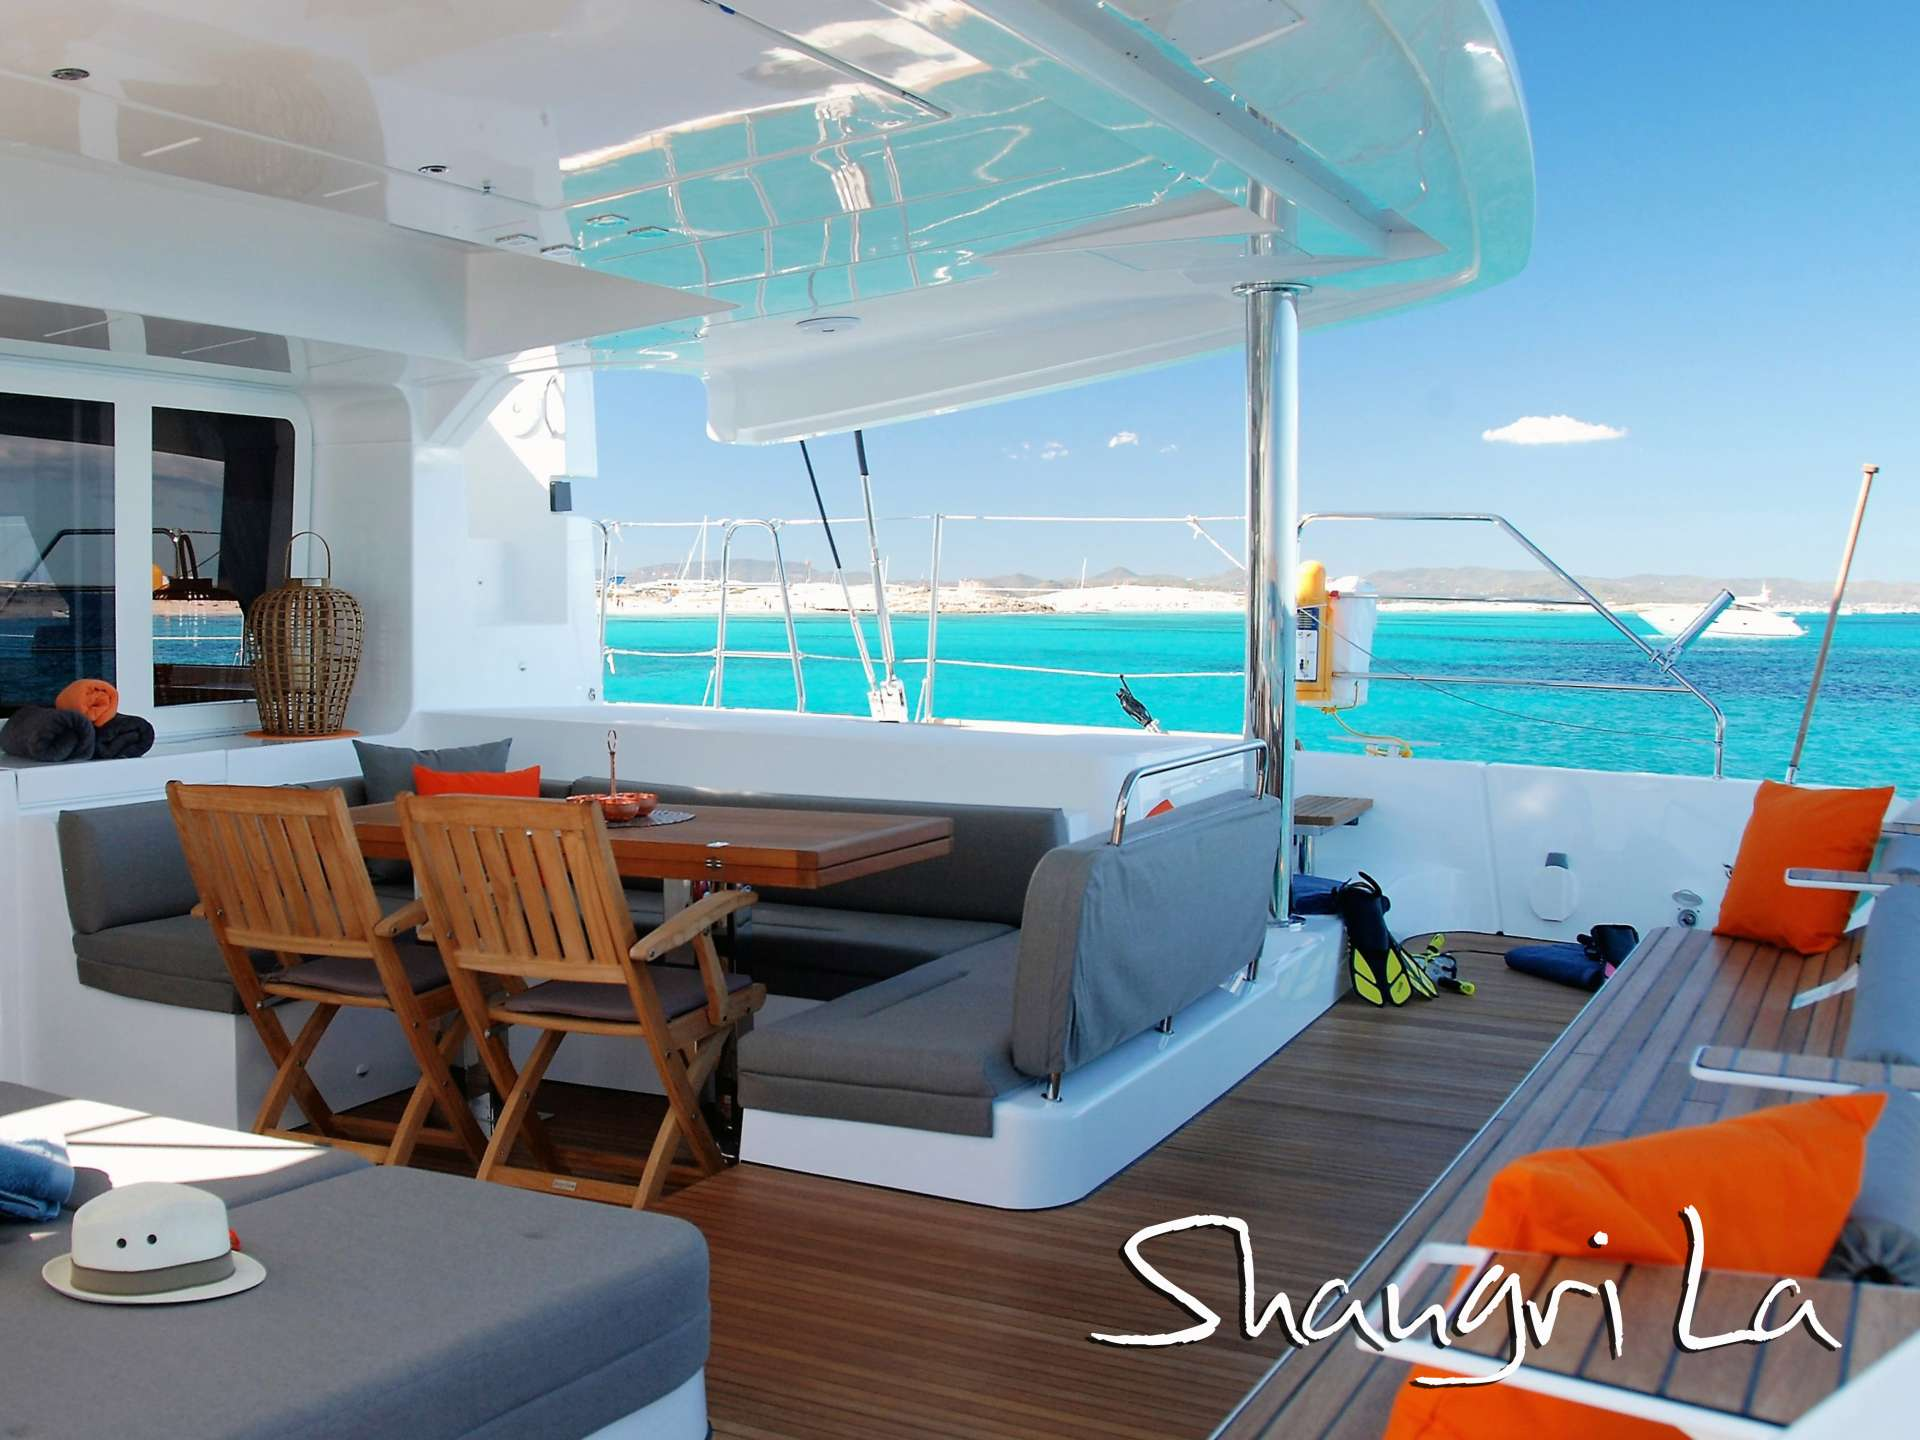 Cat Yacht 'Cat', 8 PAX, 2 Crew, 52.00 Ft, 15.00 Meters, Built 2016, Lagoon, Refit Year